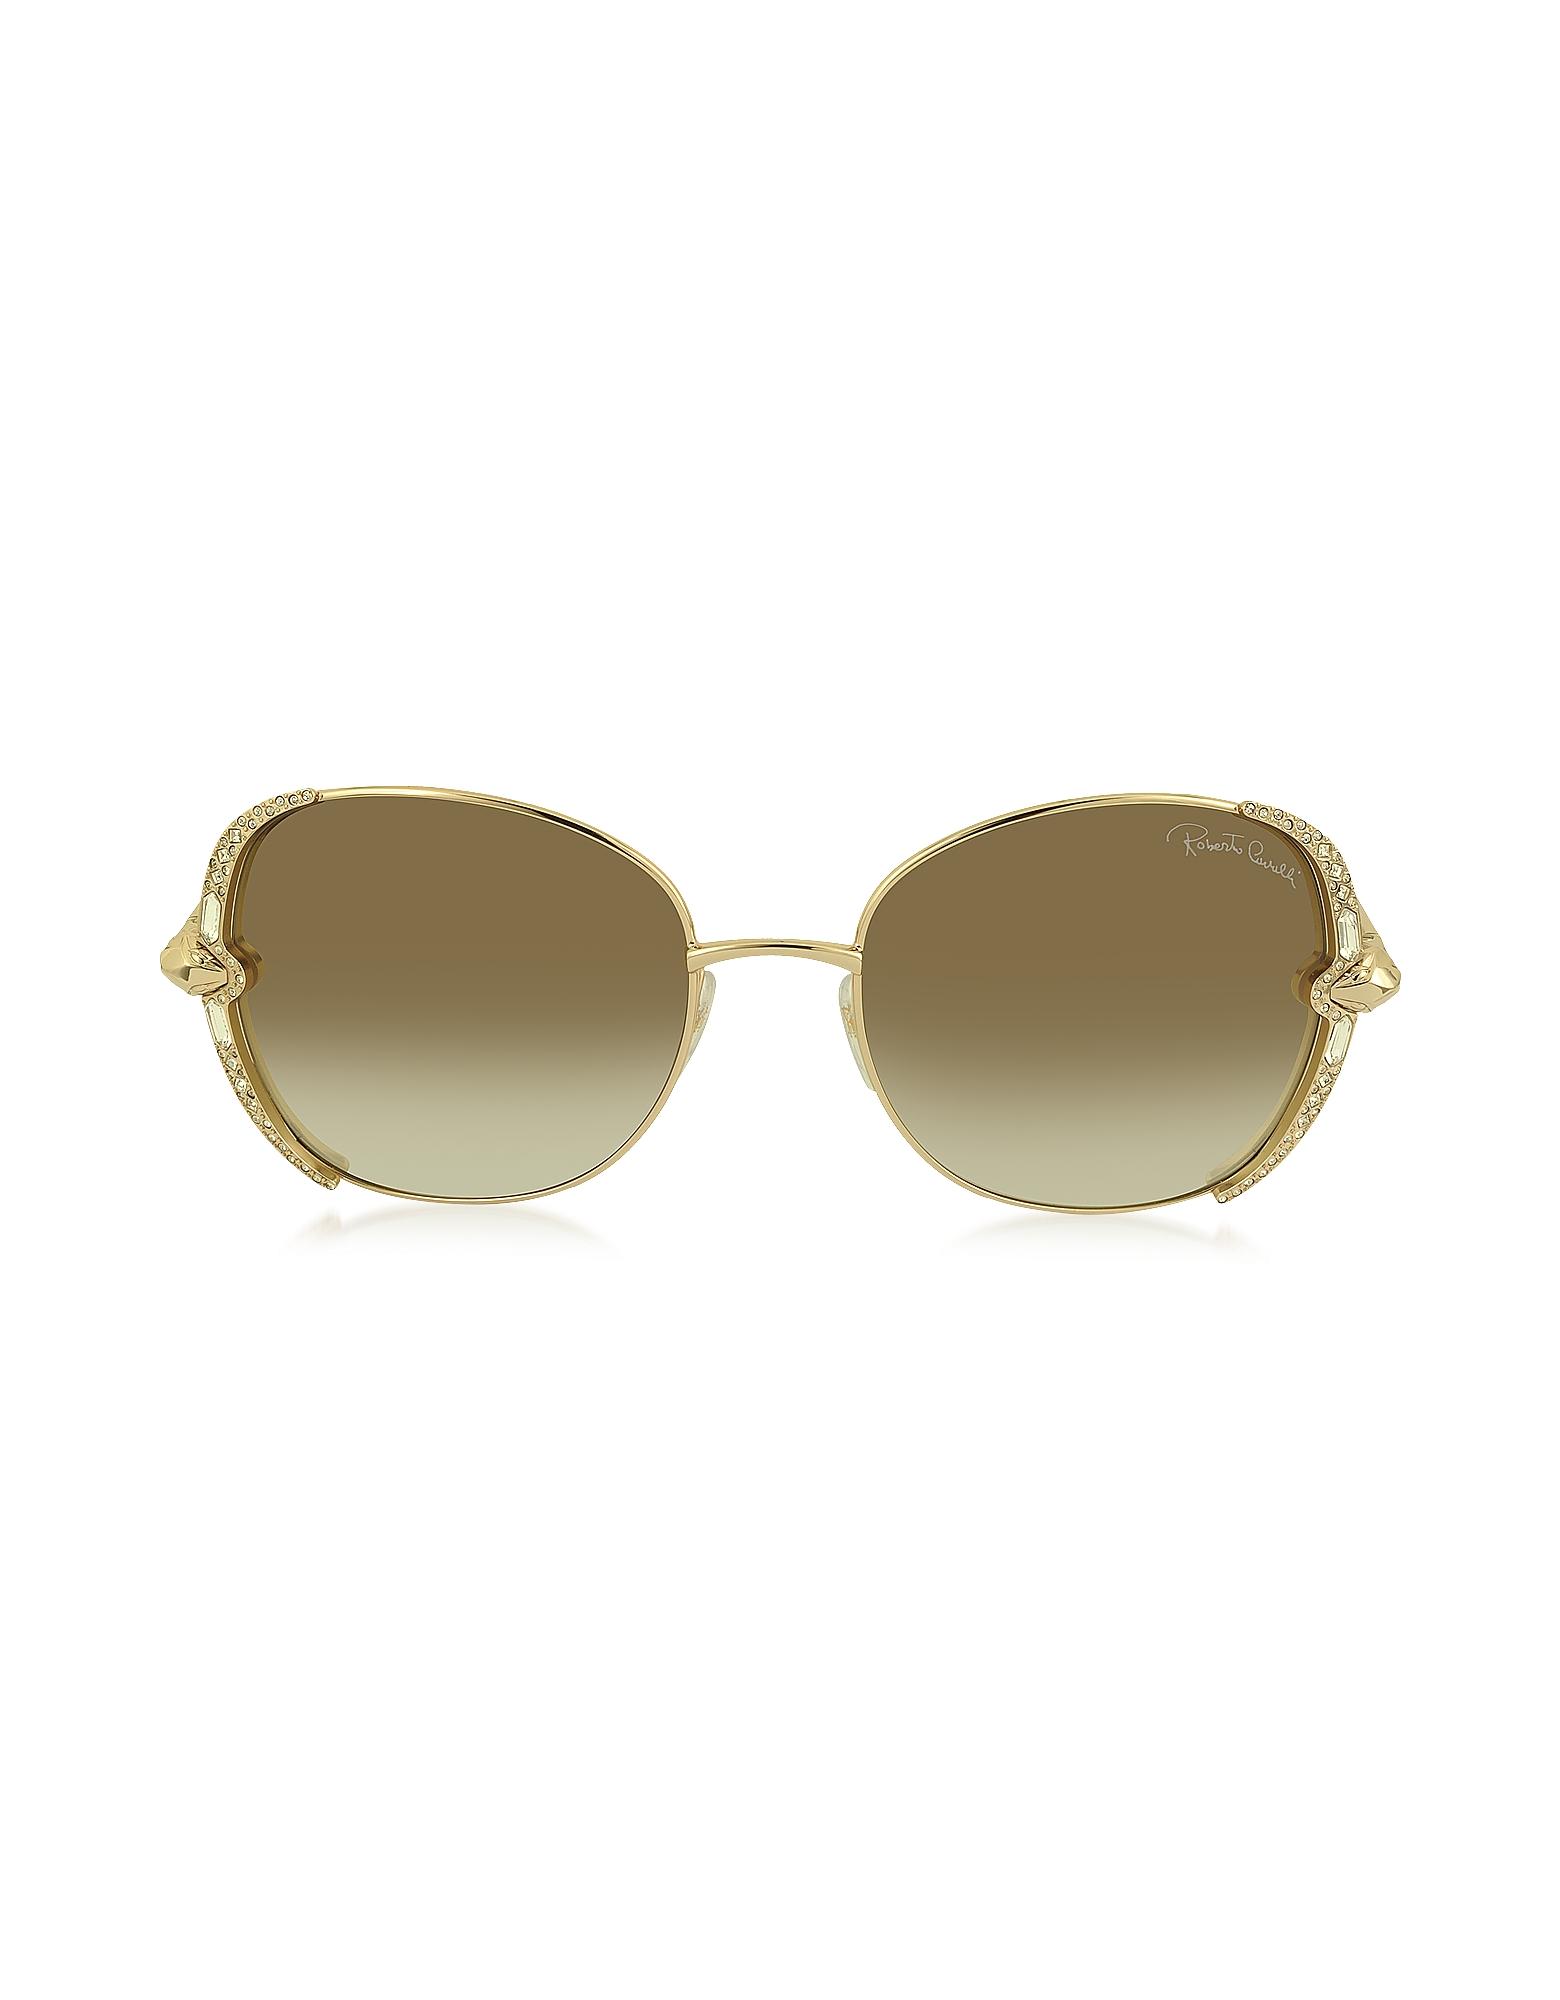 Roberto Cavalli Designer Sunglasses, SUBRA 974S Metal Square Oversized Women's Sunglasses w/Crystals